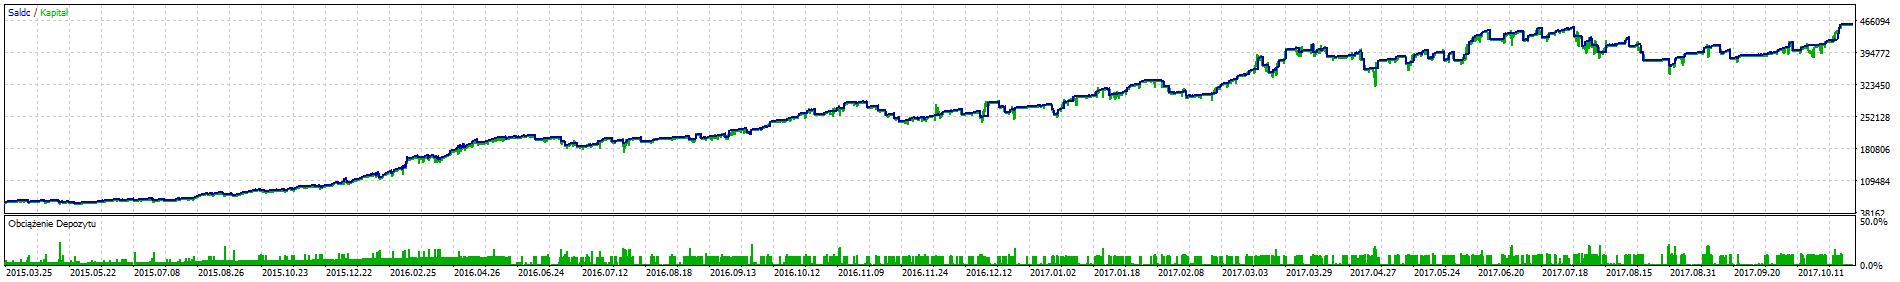 Day trading strategie i systemy Forex [Poradnik]